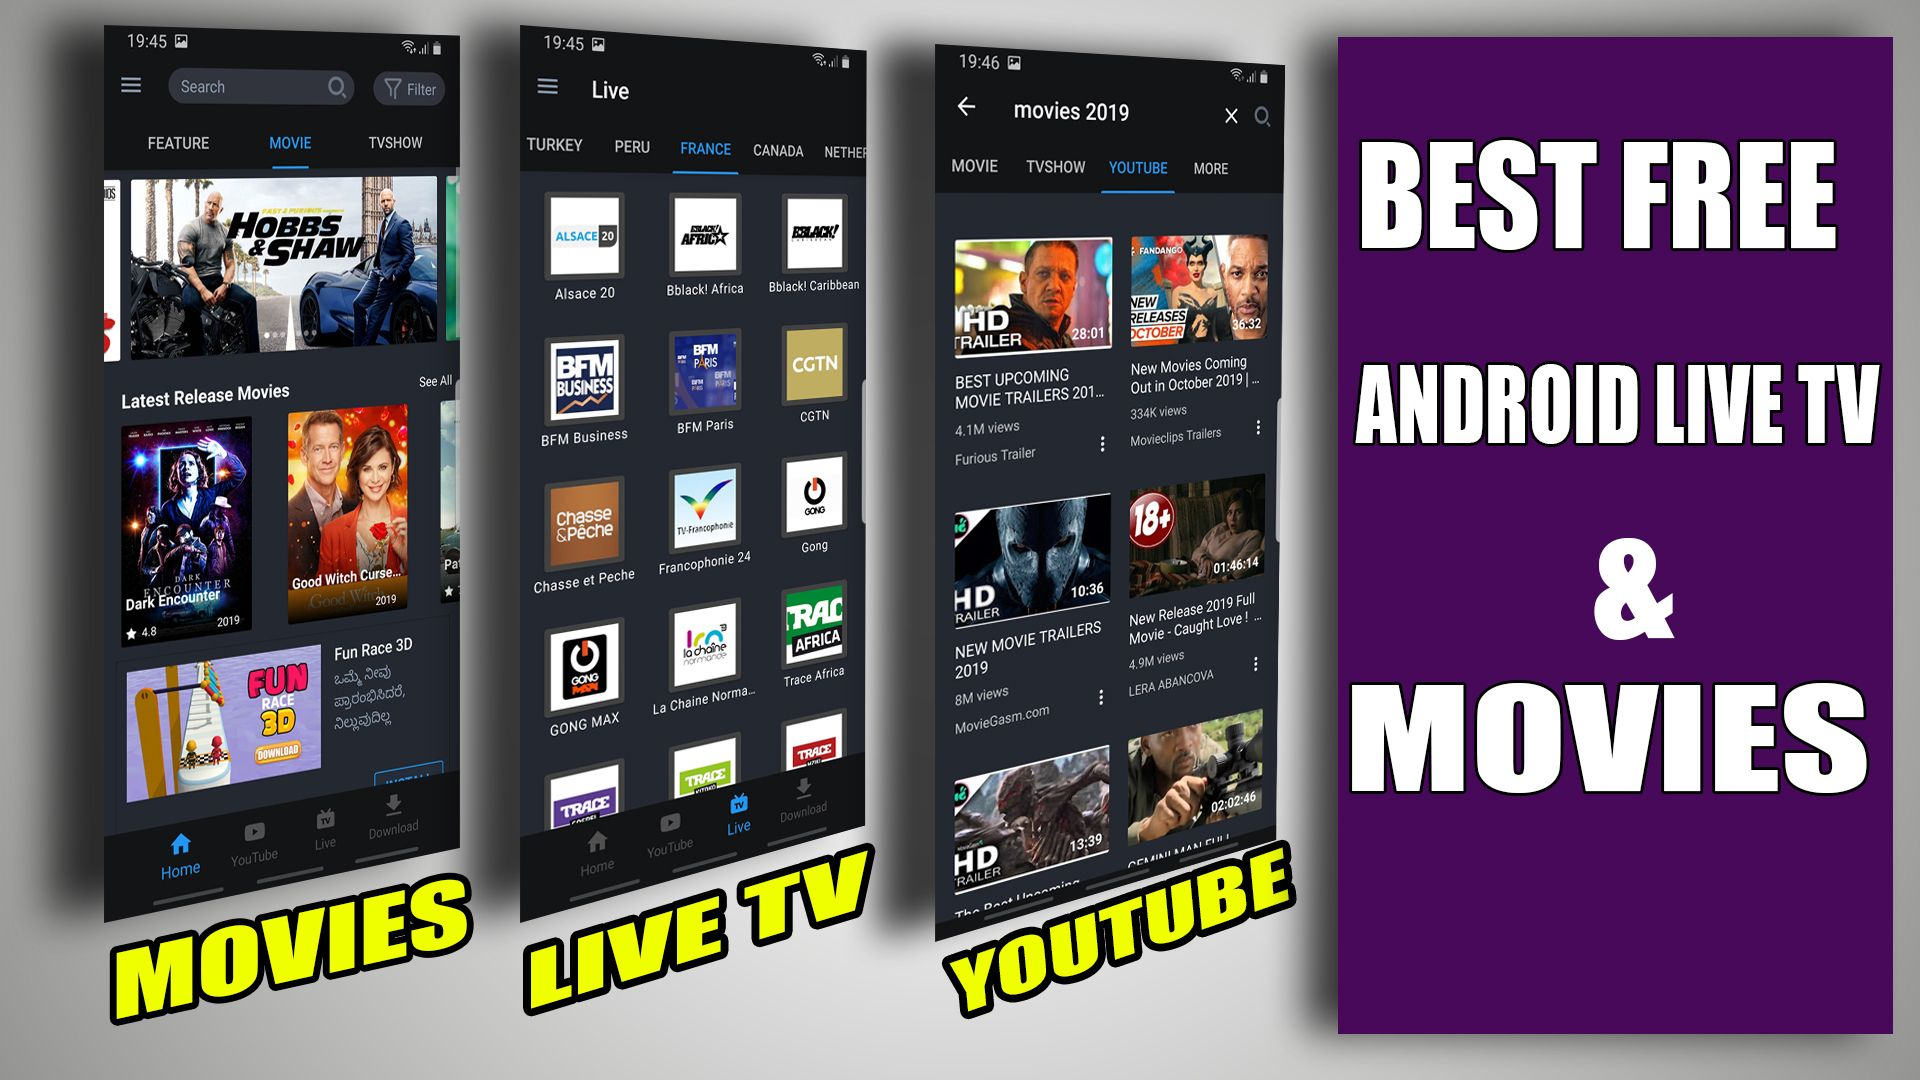 VidMix APK Best Free Android Live tv & Movies & TVshows